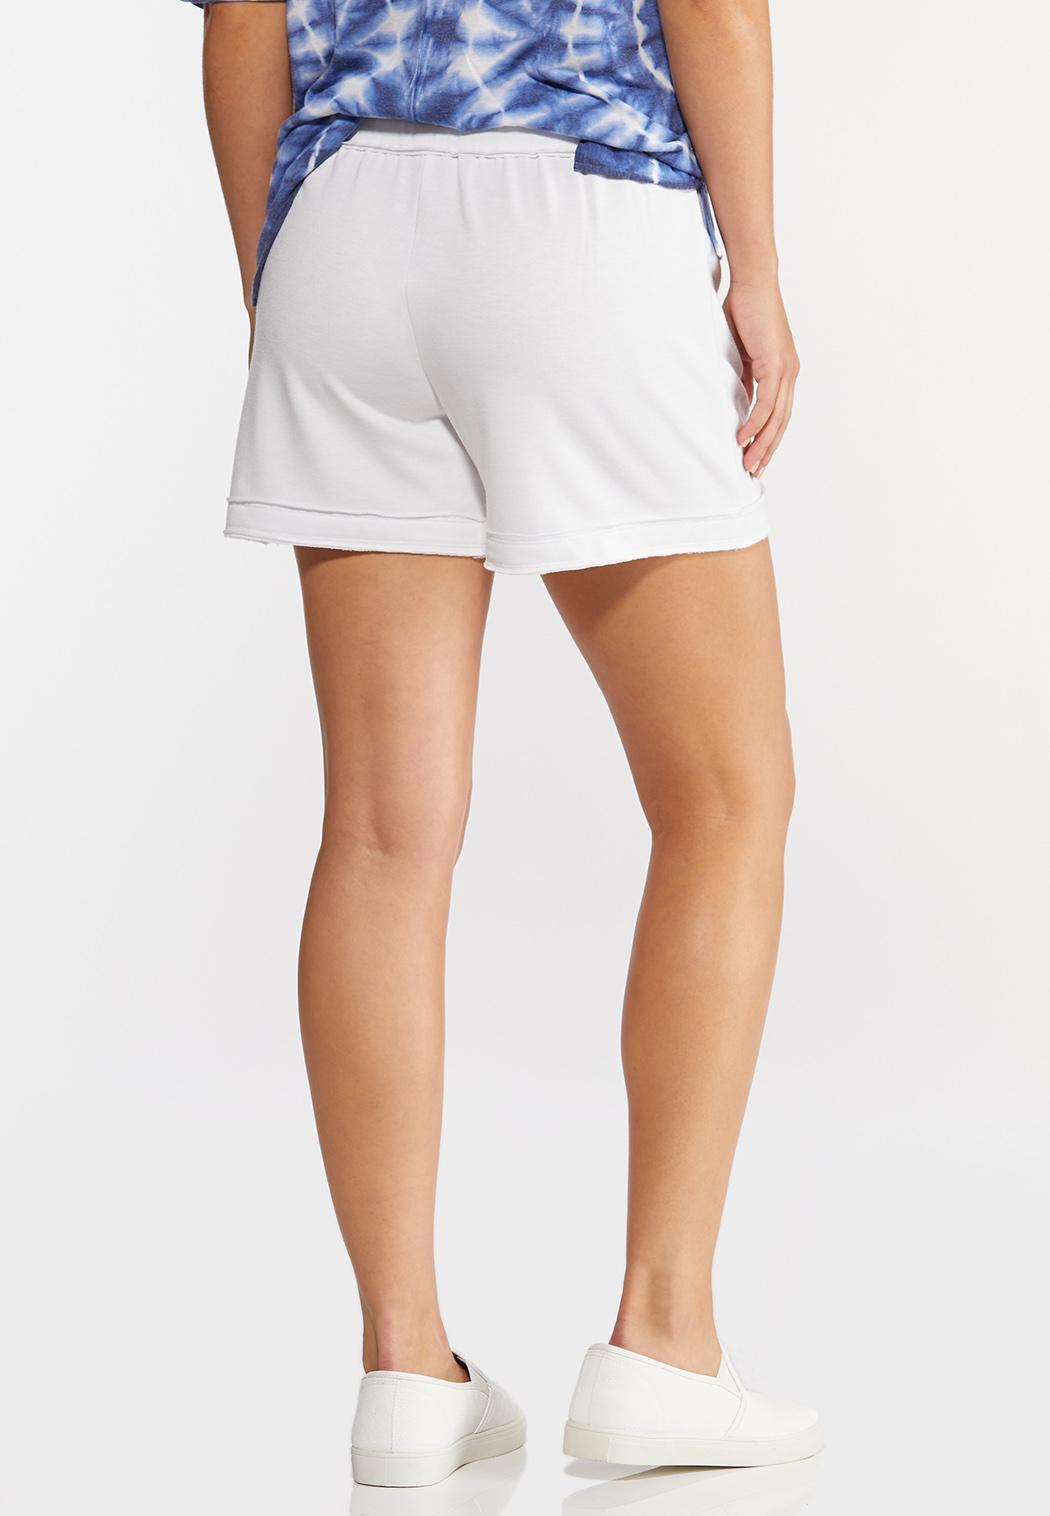 French Terry Raw Hem Shorts (Item #44275958)